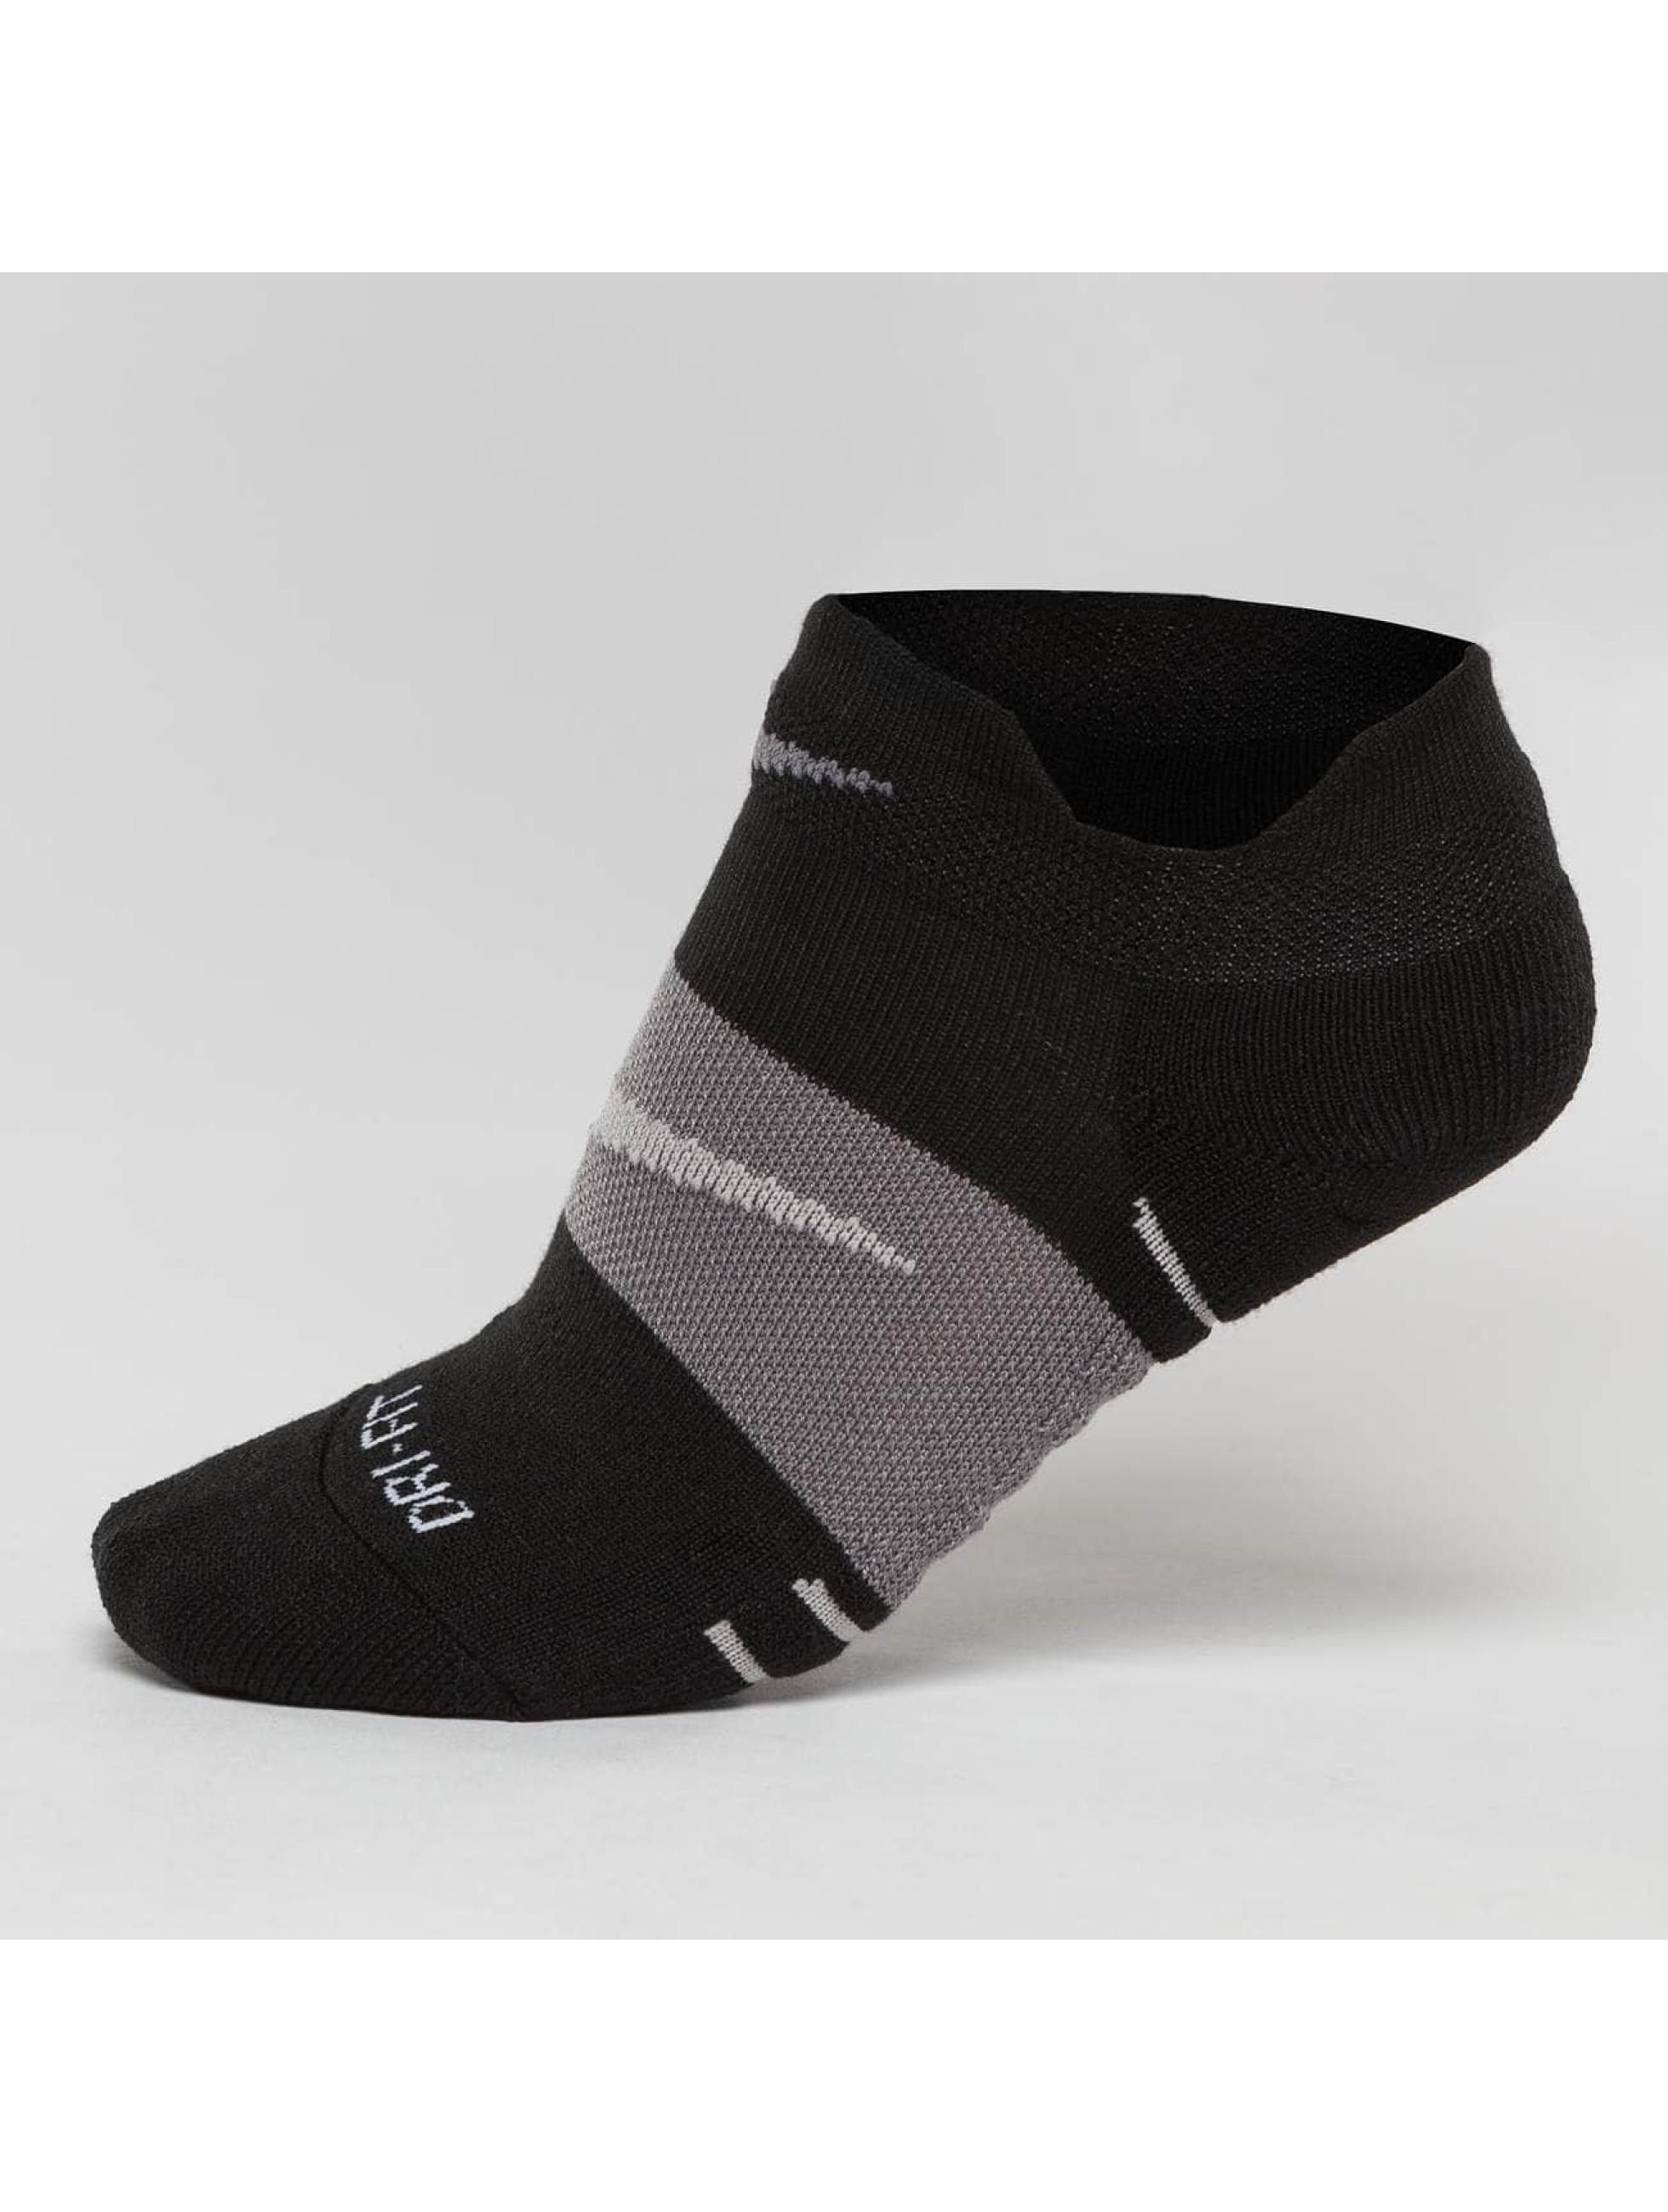 Nike Performance Socks Dry Cushion Low Training 3 Pack black